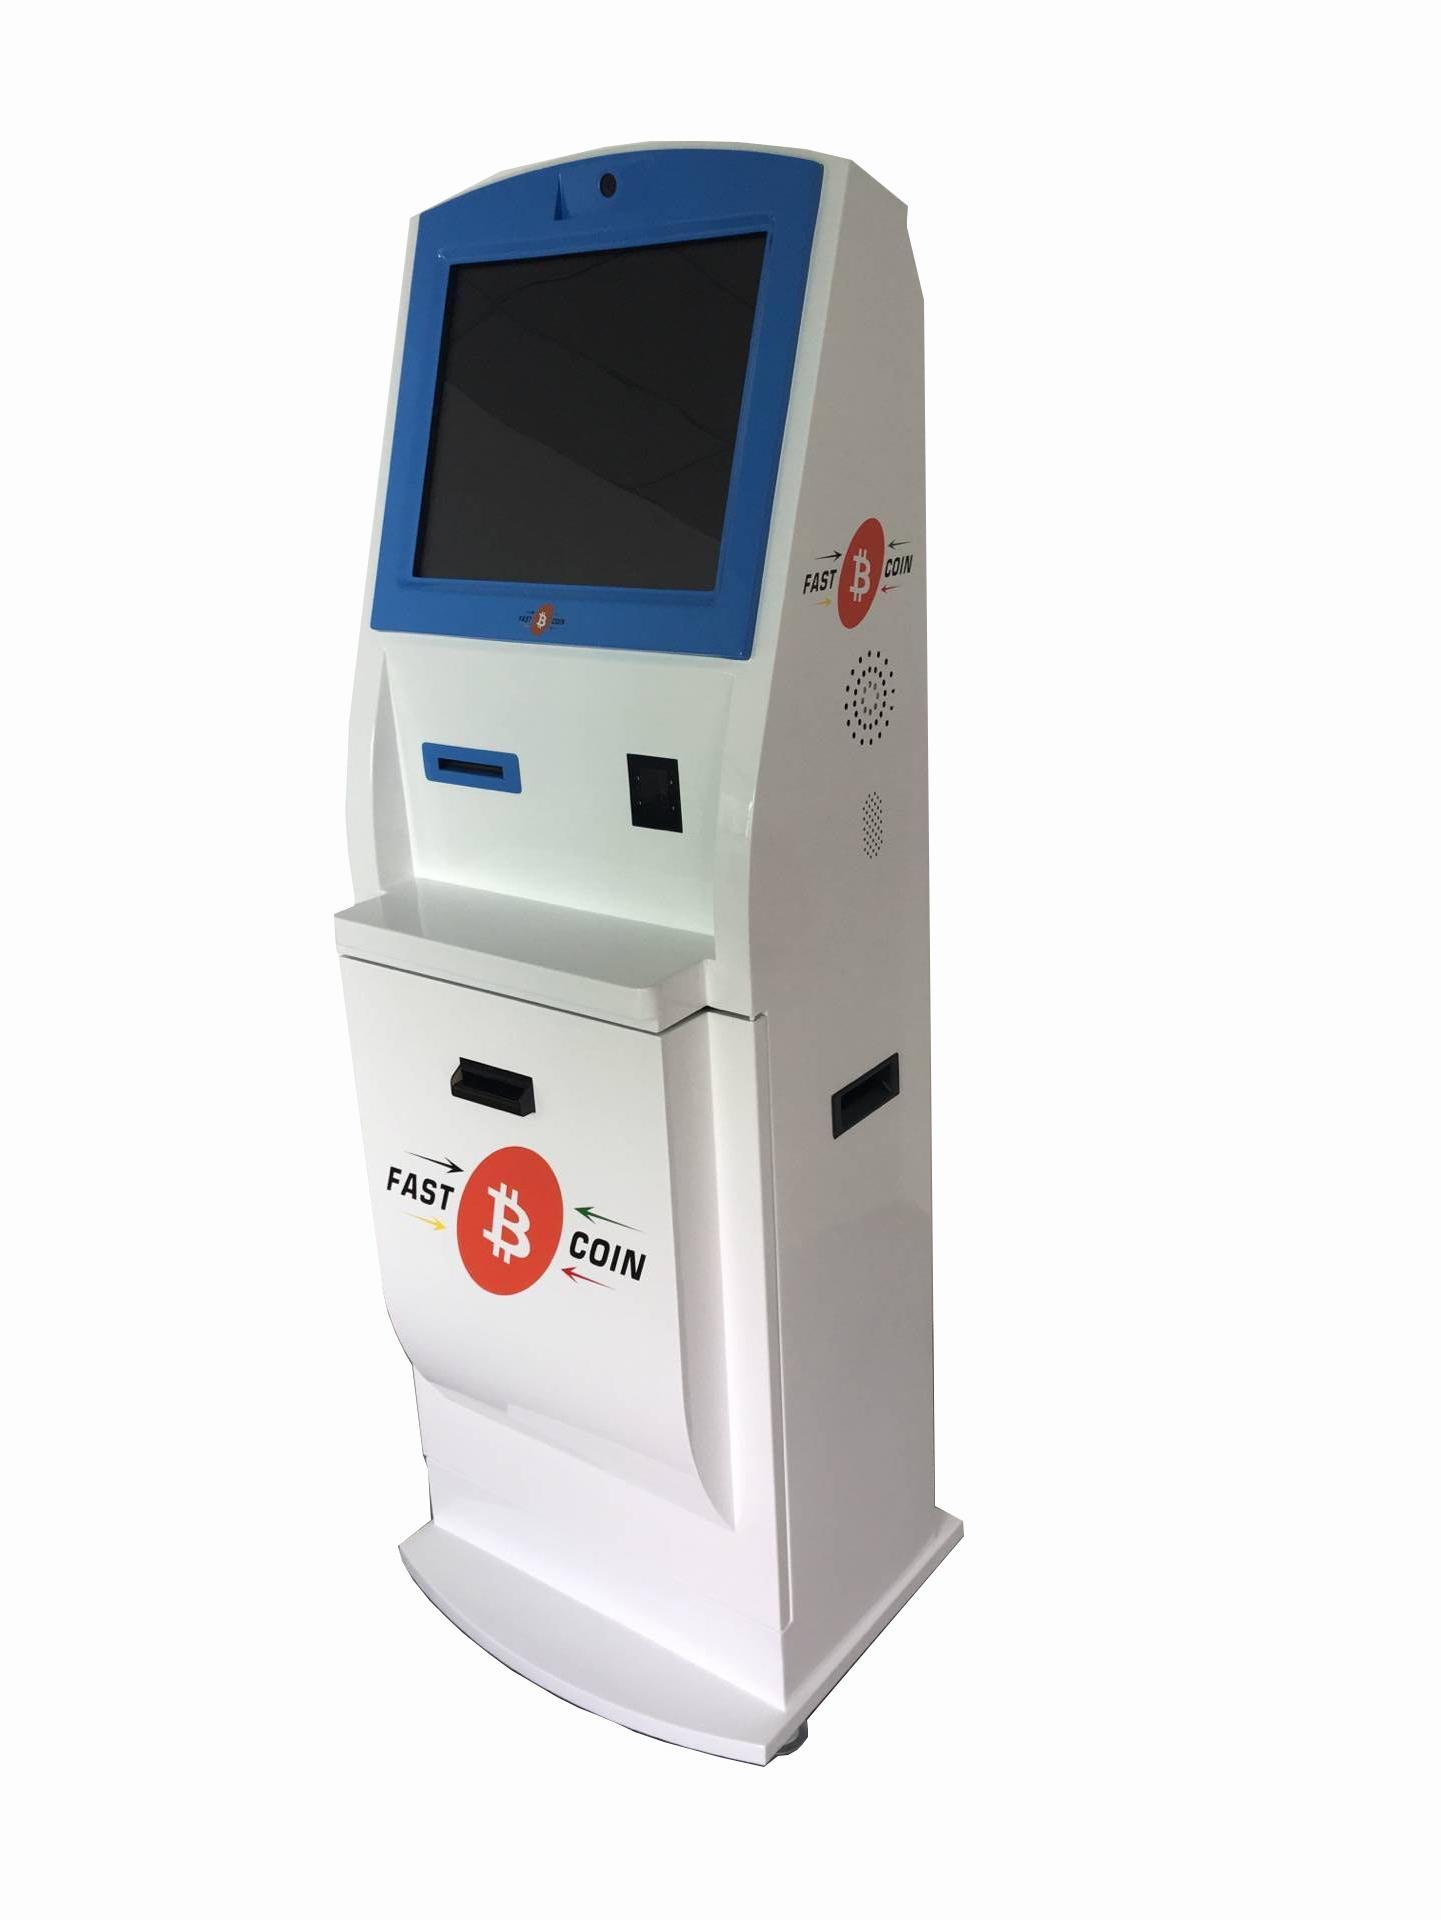 self-service bill payment kiosk 3